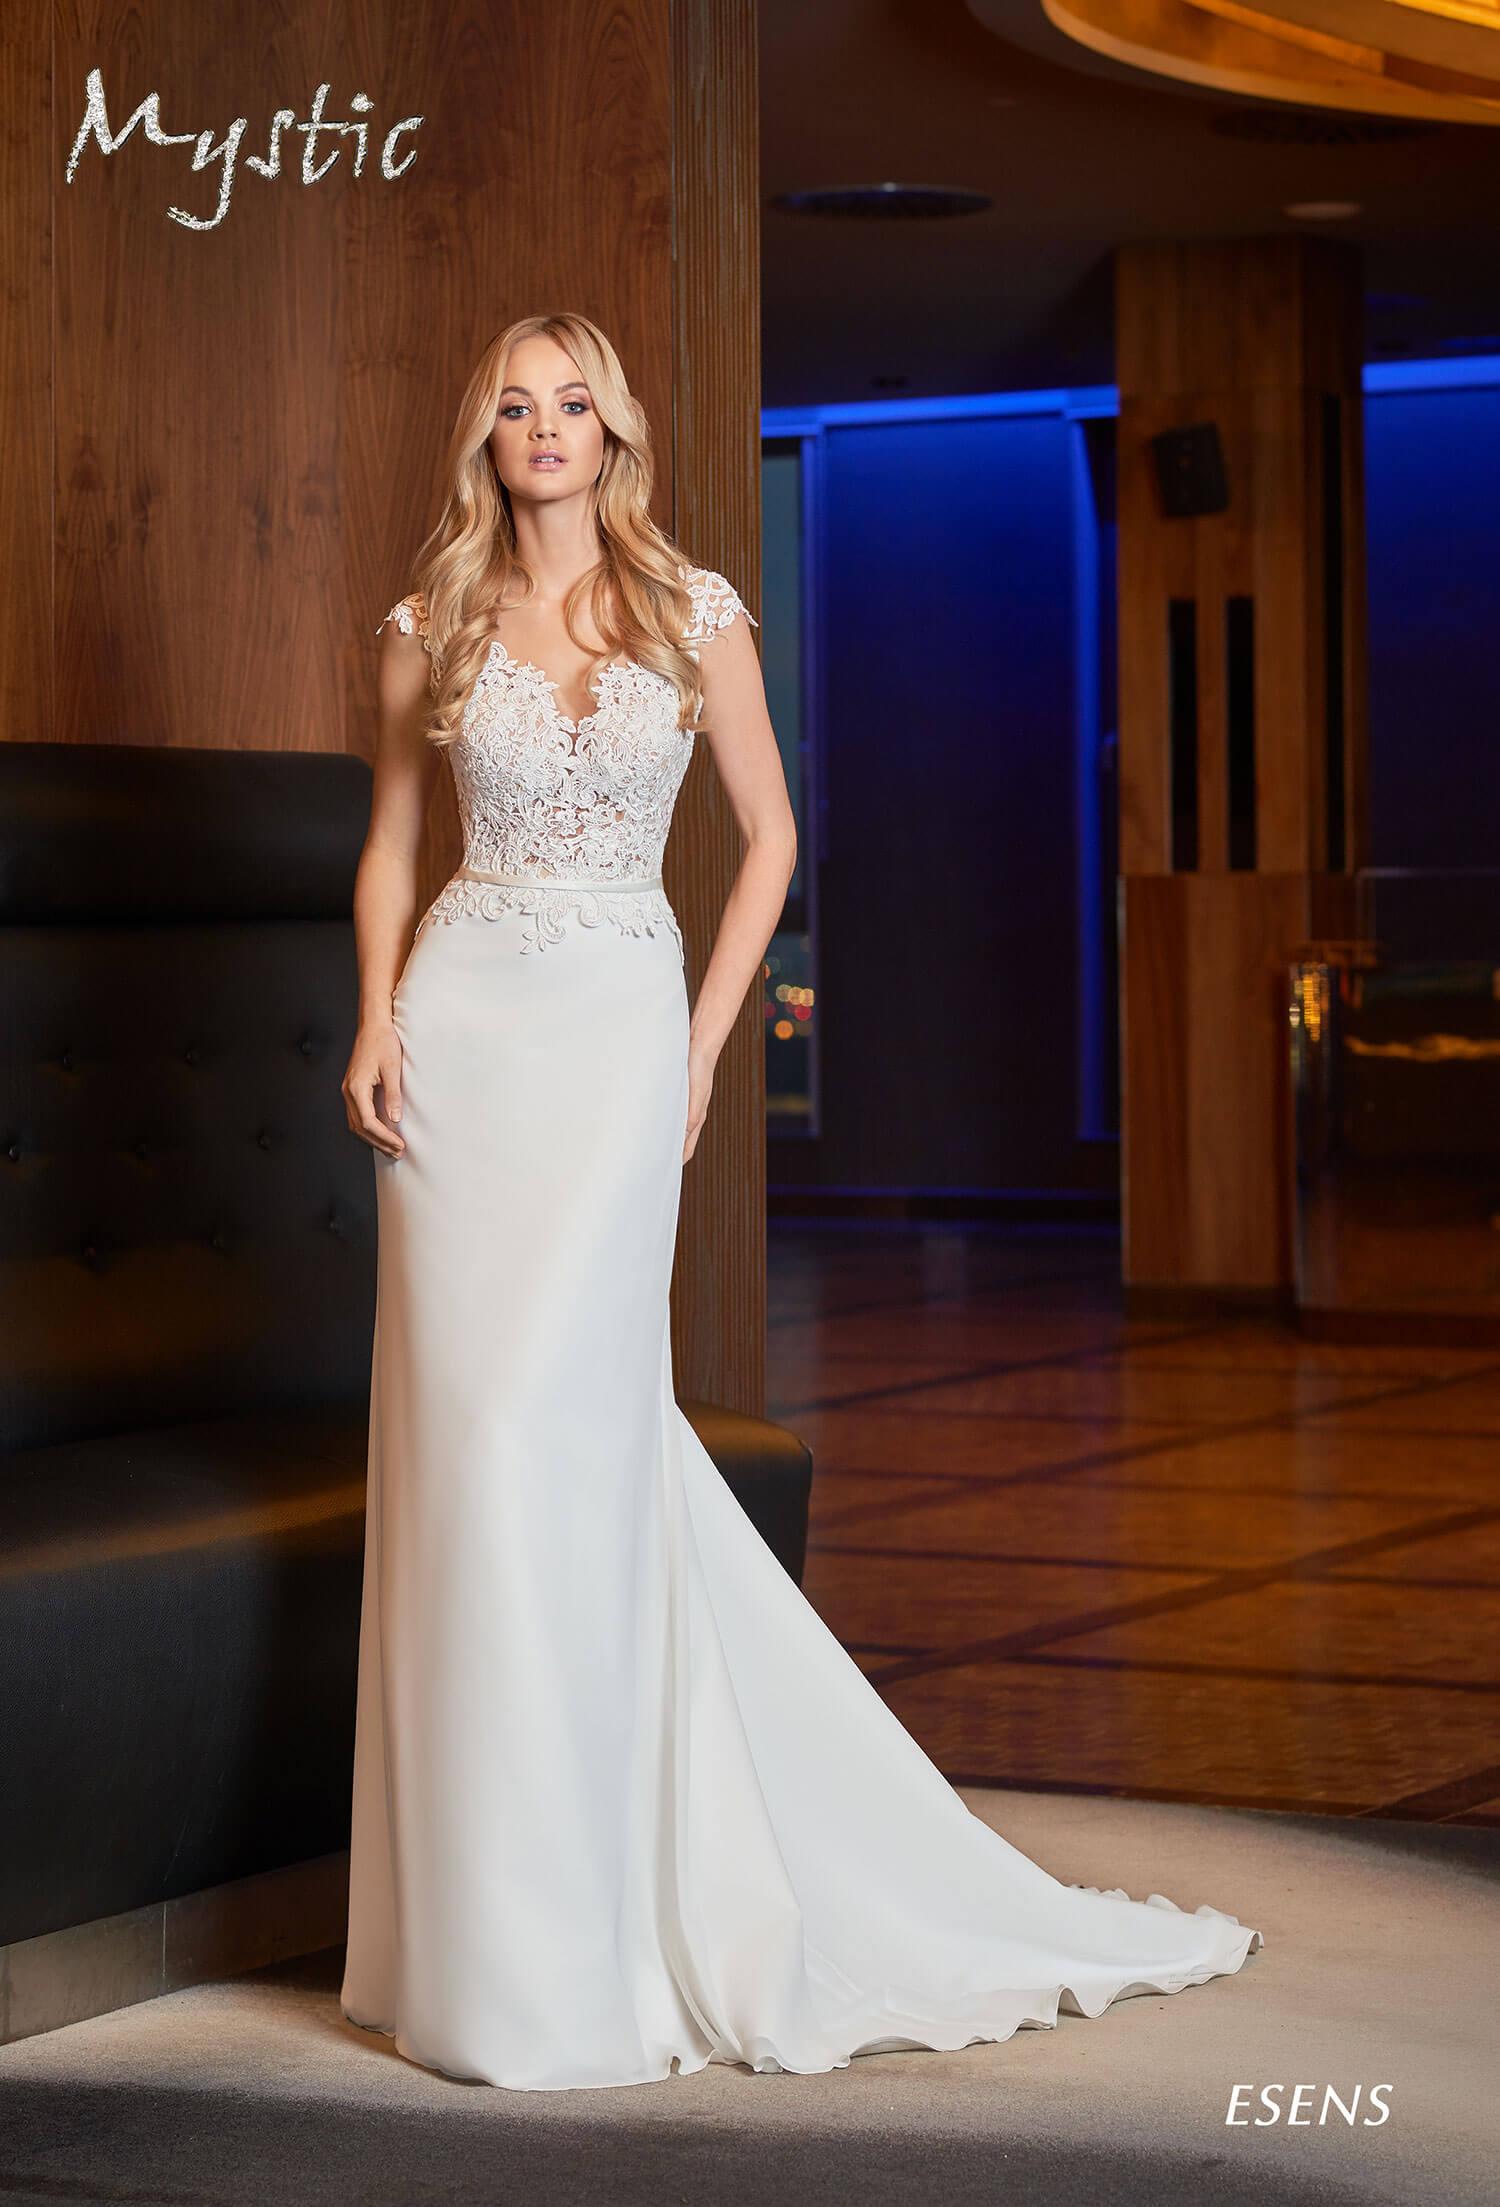 0fb4331a33 Mystic Bridal - producent i projektant sukien ślubnych